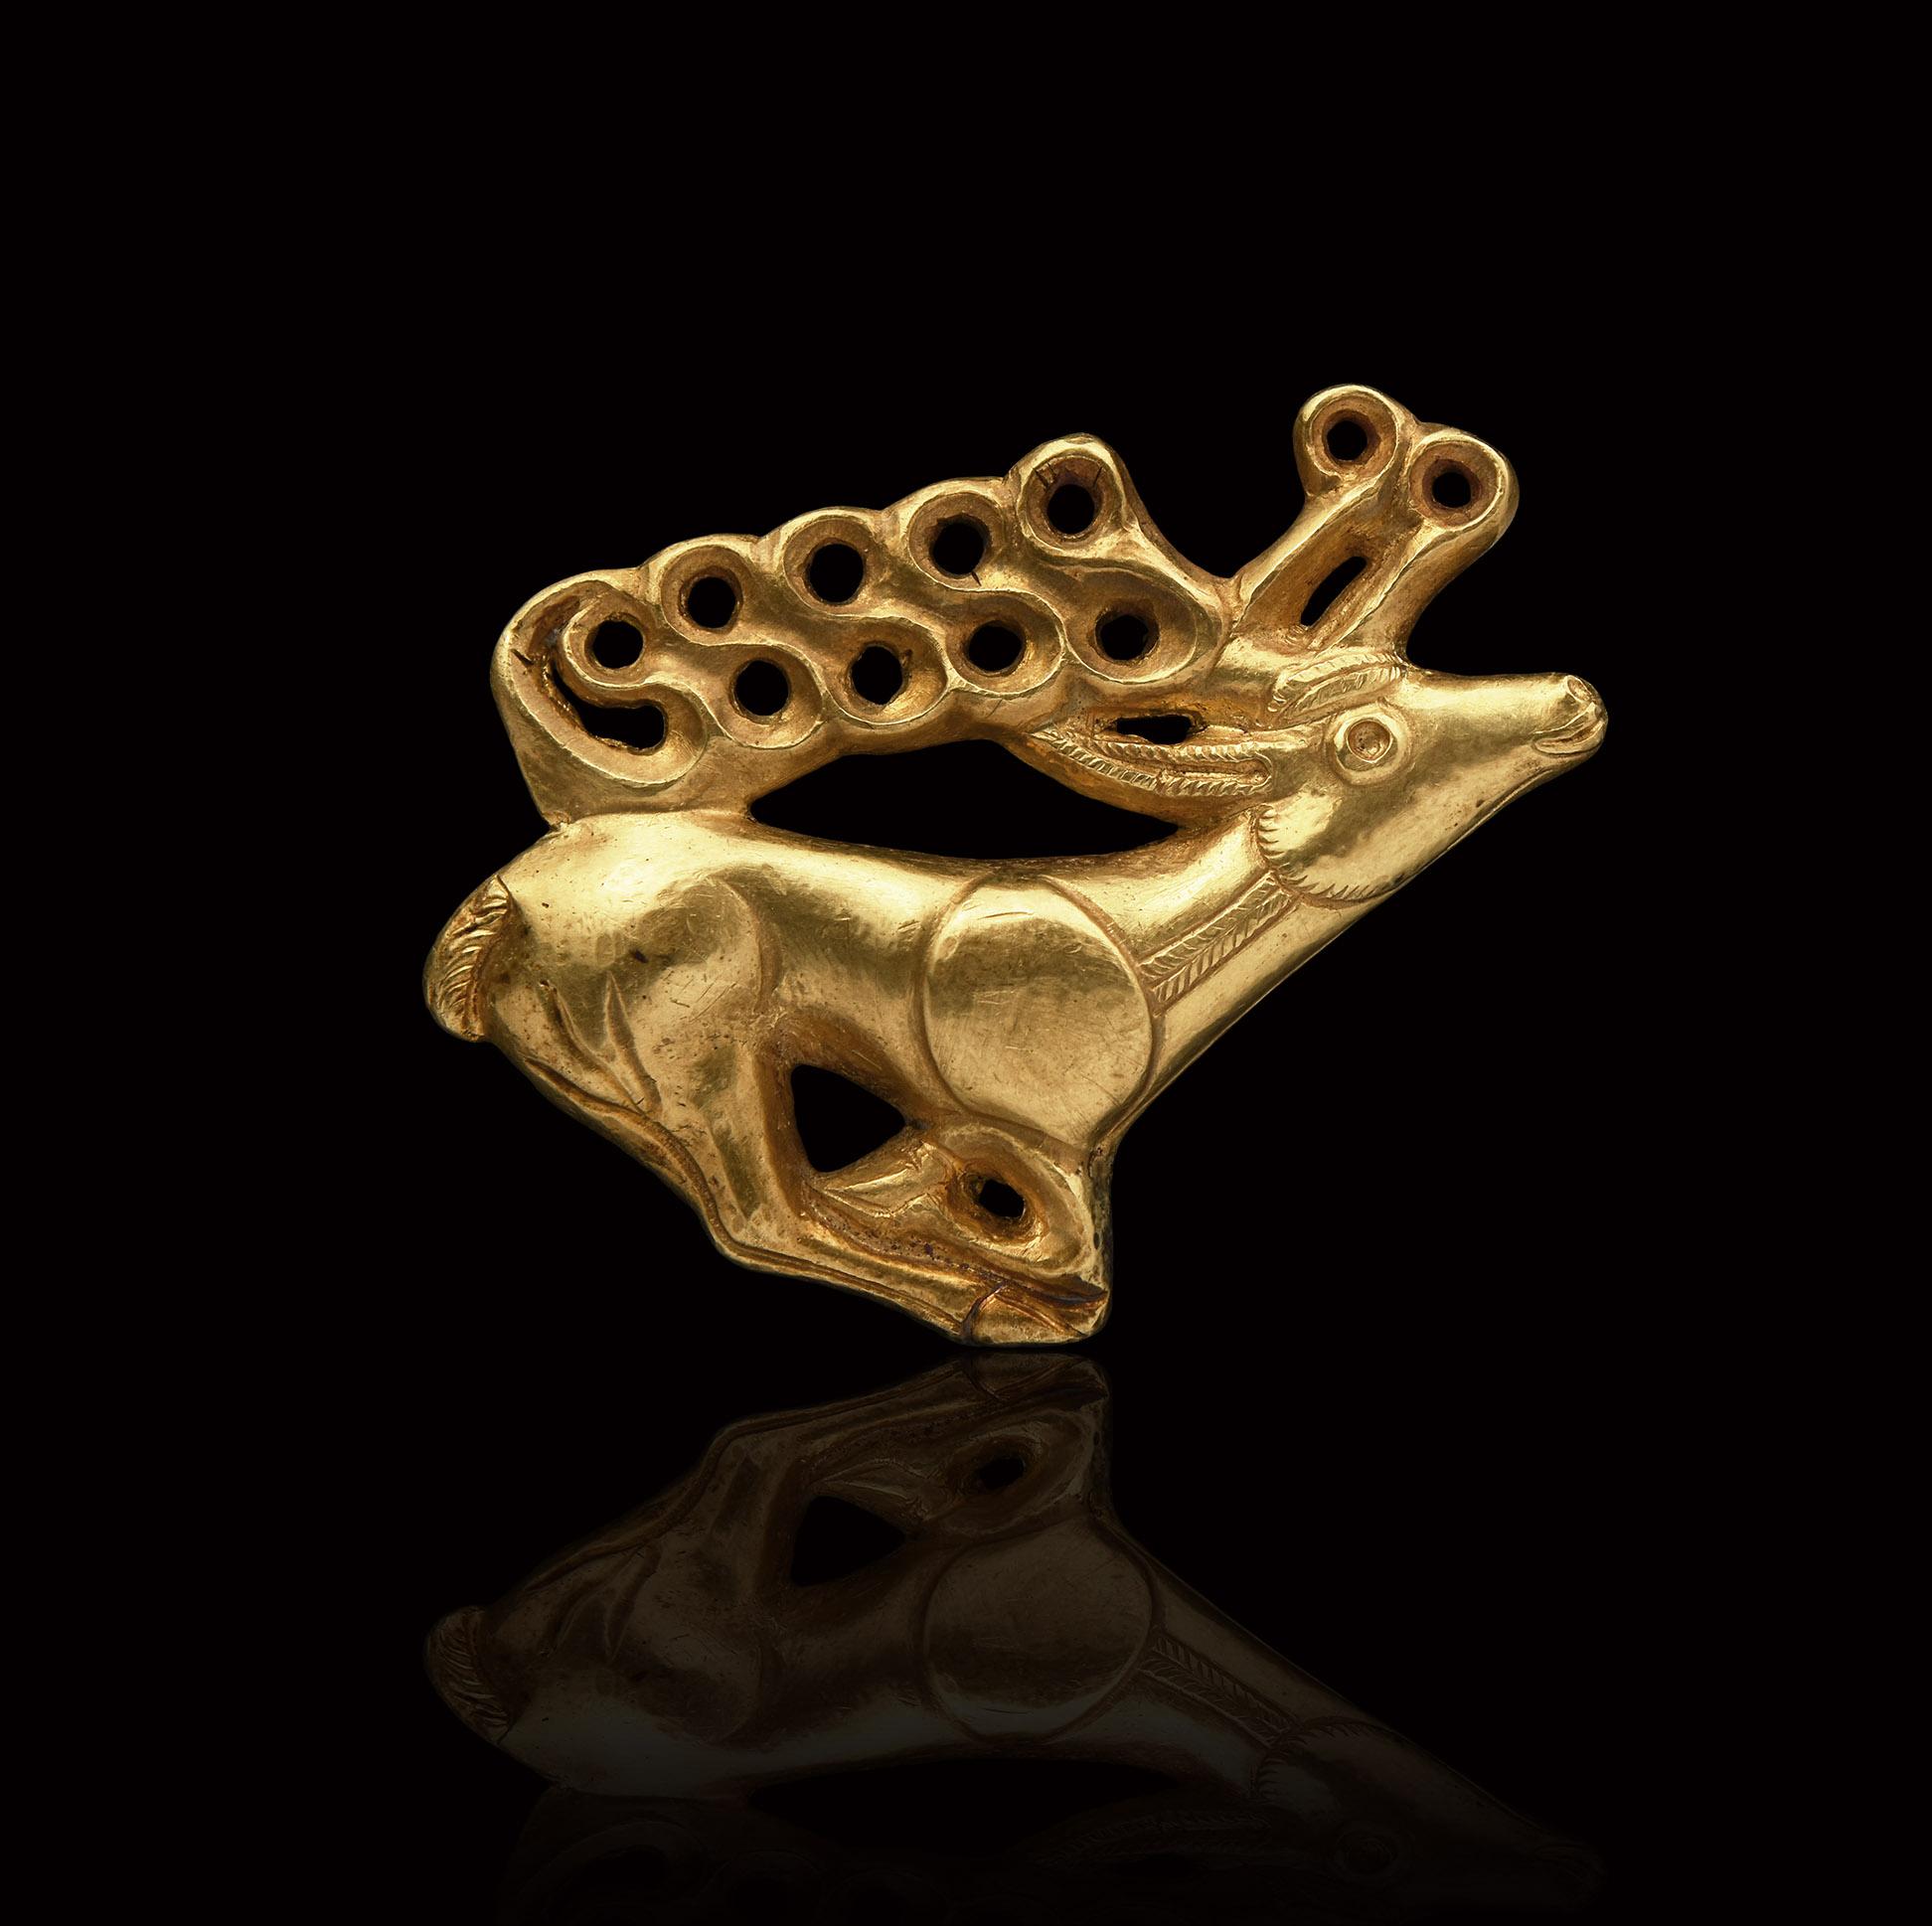 Scythian Gold Stag Shield Ornament